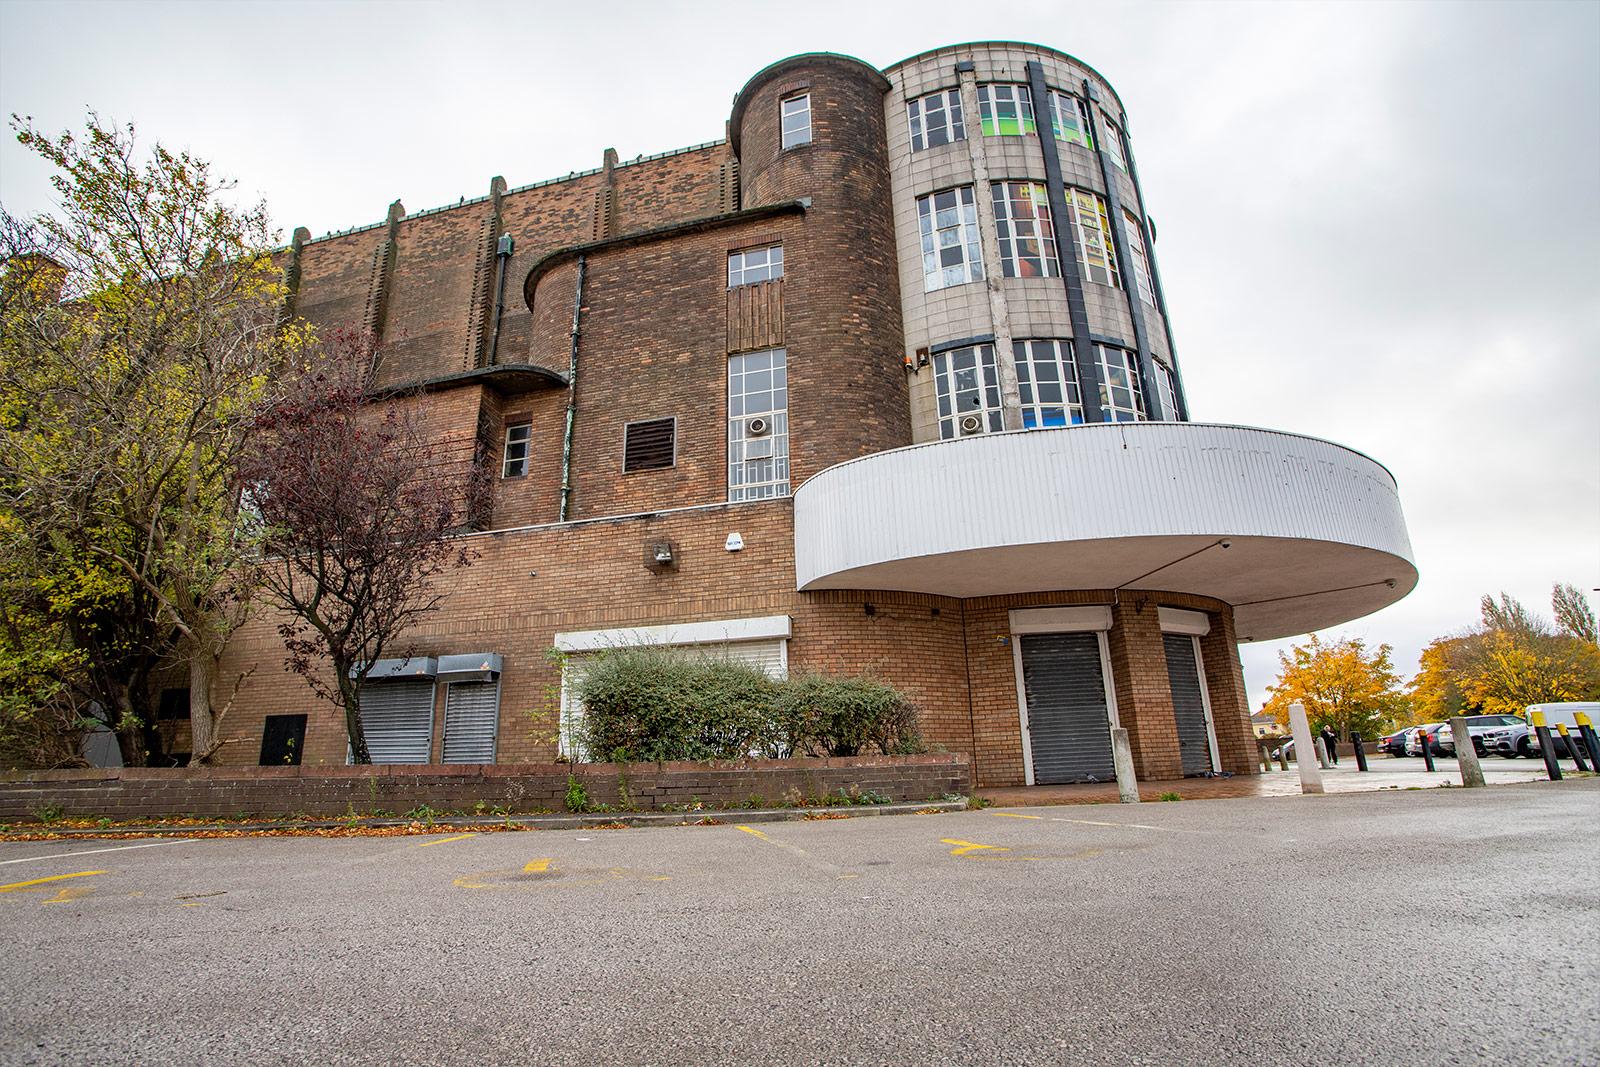 The former Abbey Cinema approach